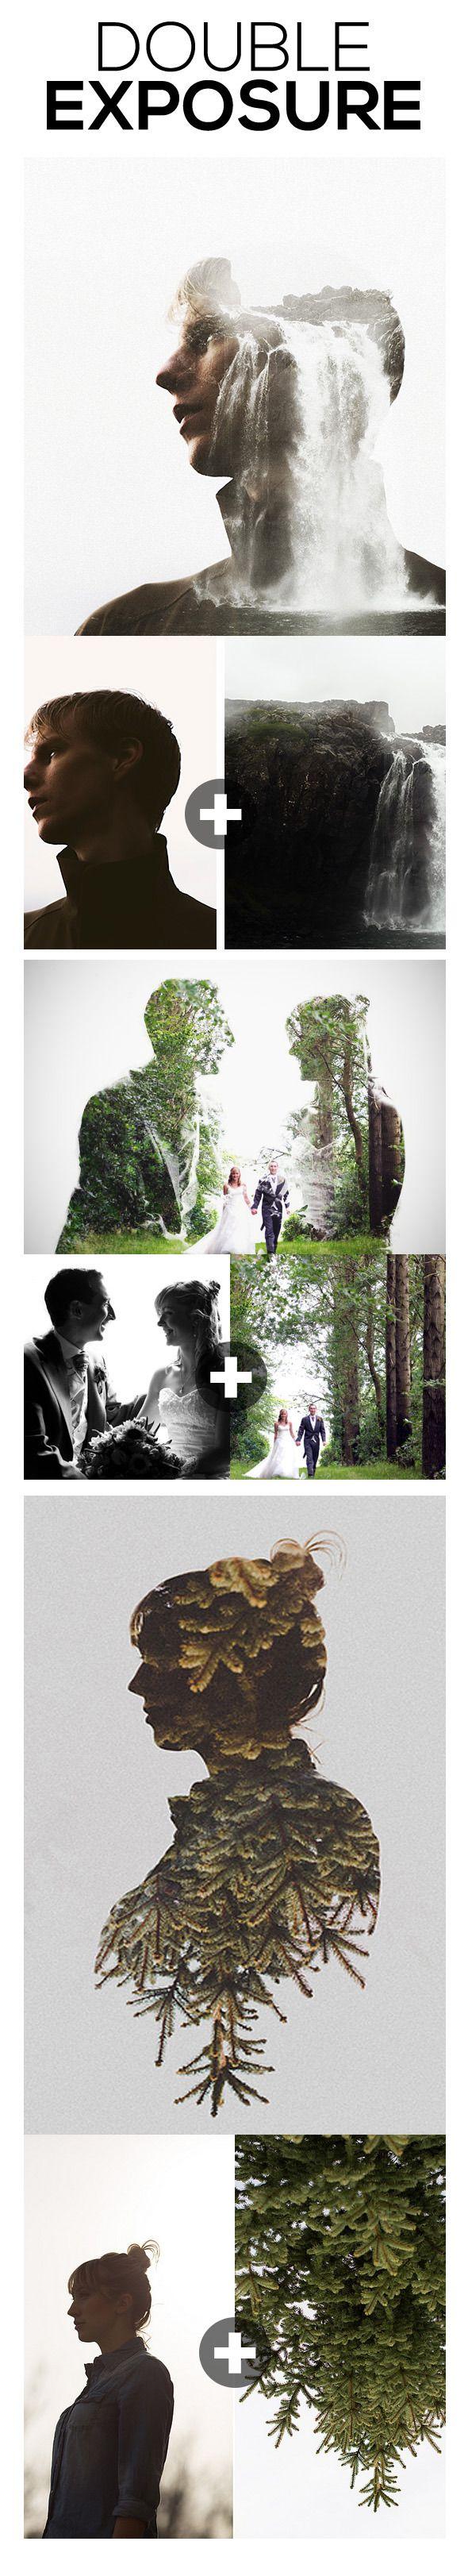 Double Exposure Photoshop Action                                                                                                                                                                                 Más